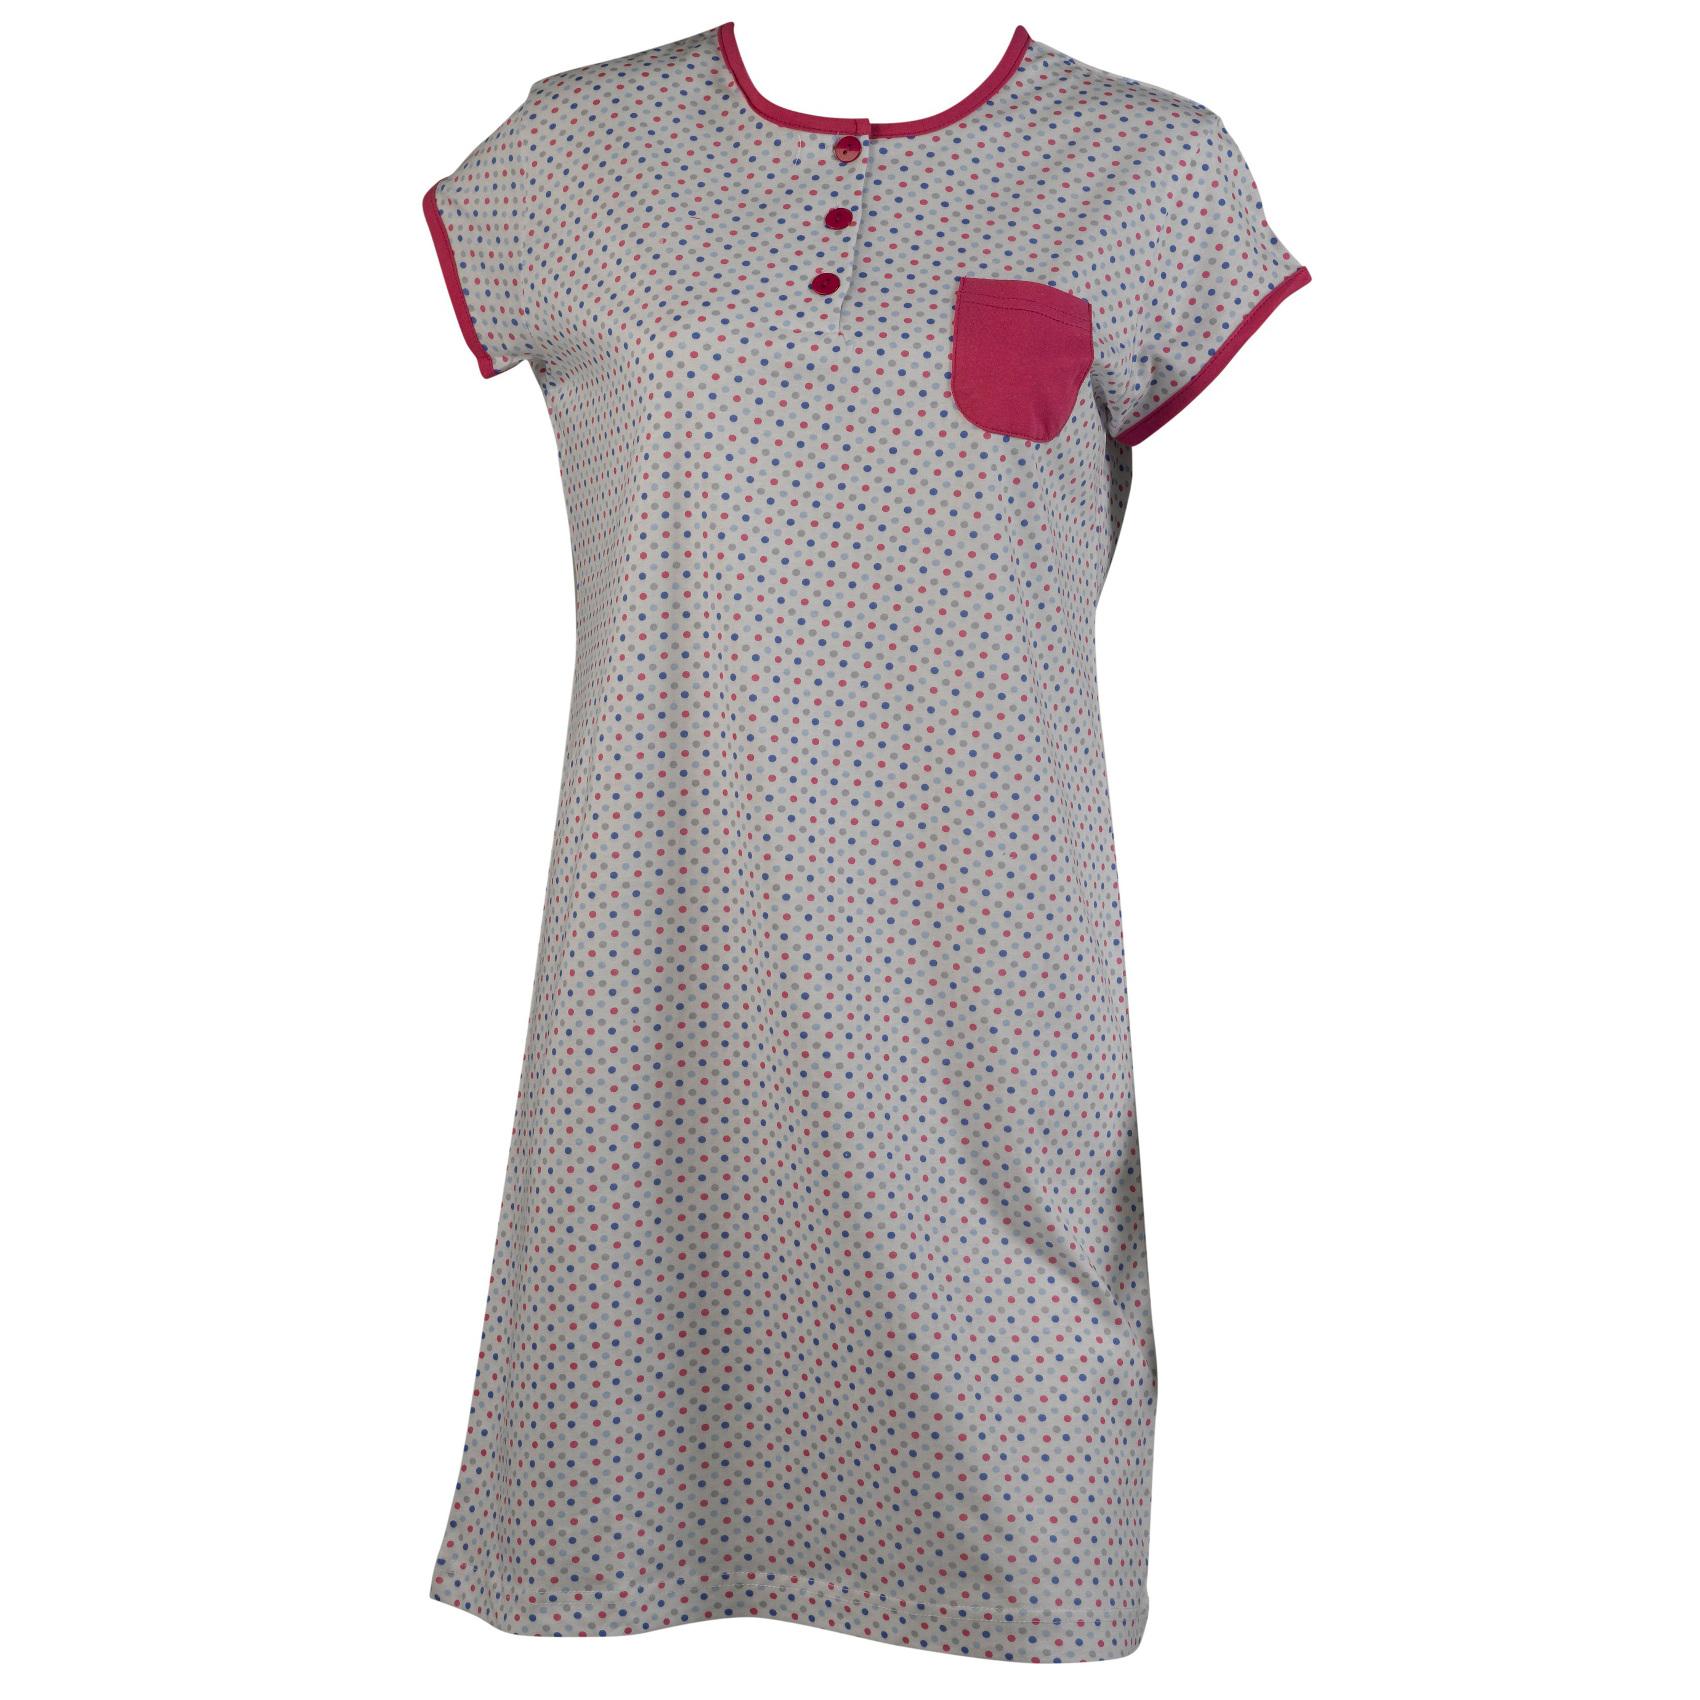 11daf311ad80 Ladies Short Sleeved Spotty Night Dress 100 Cotton Womens Polka Dot ...